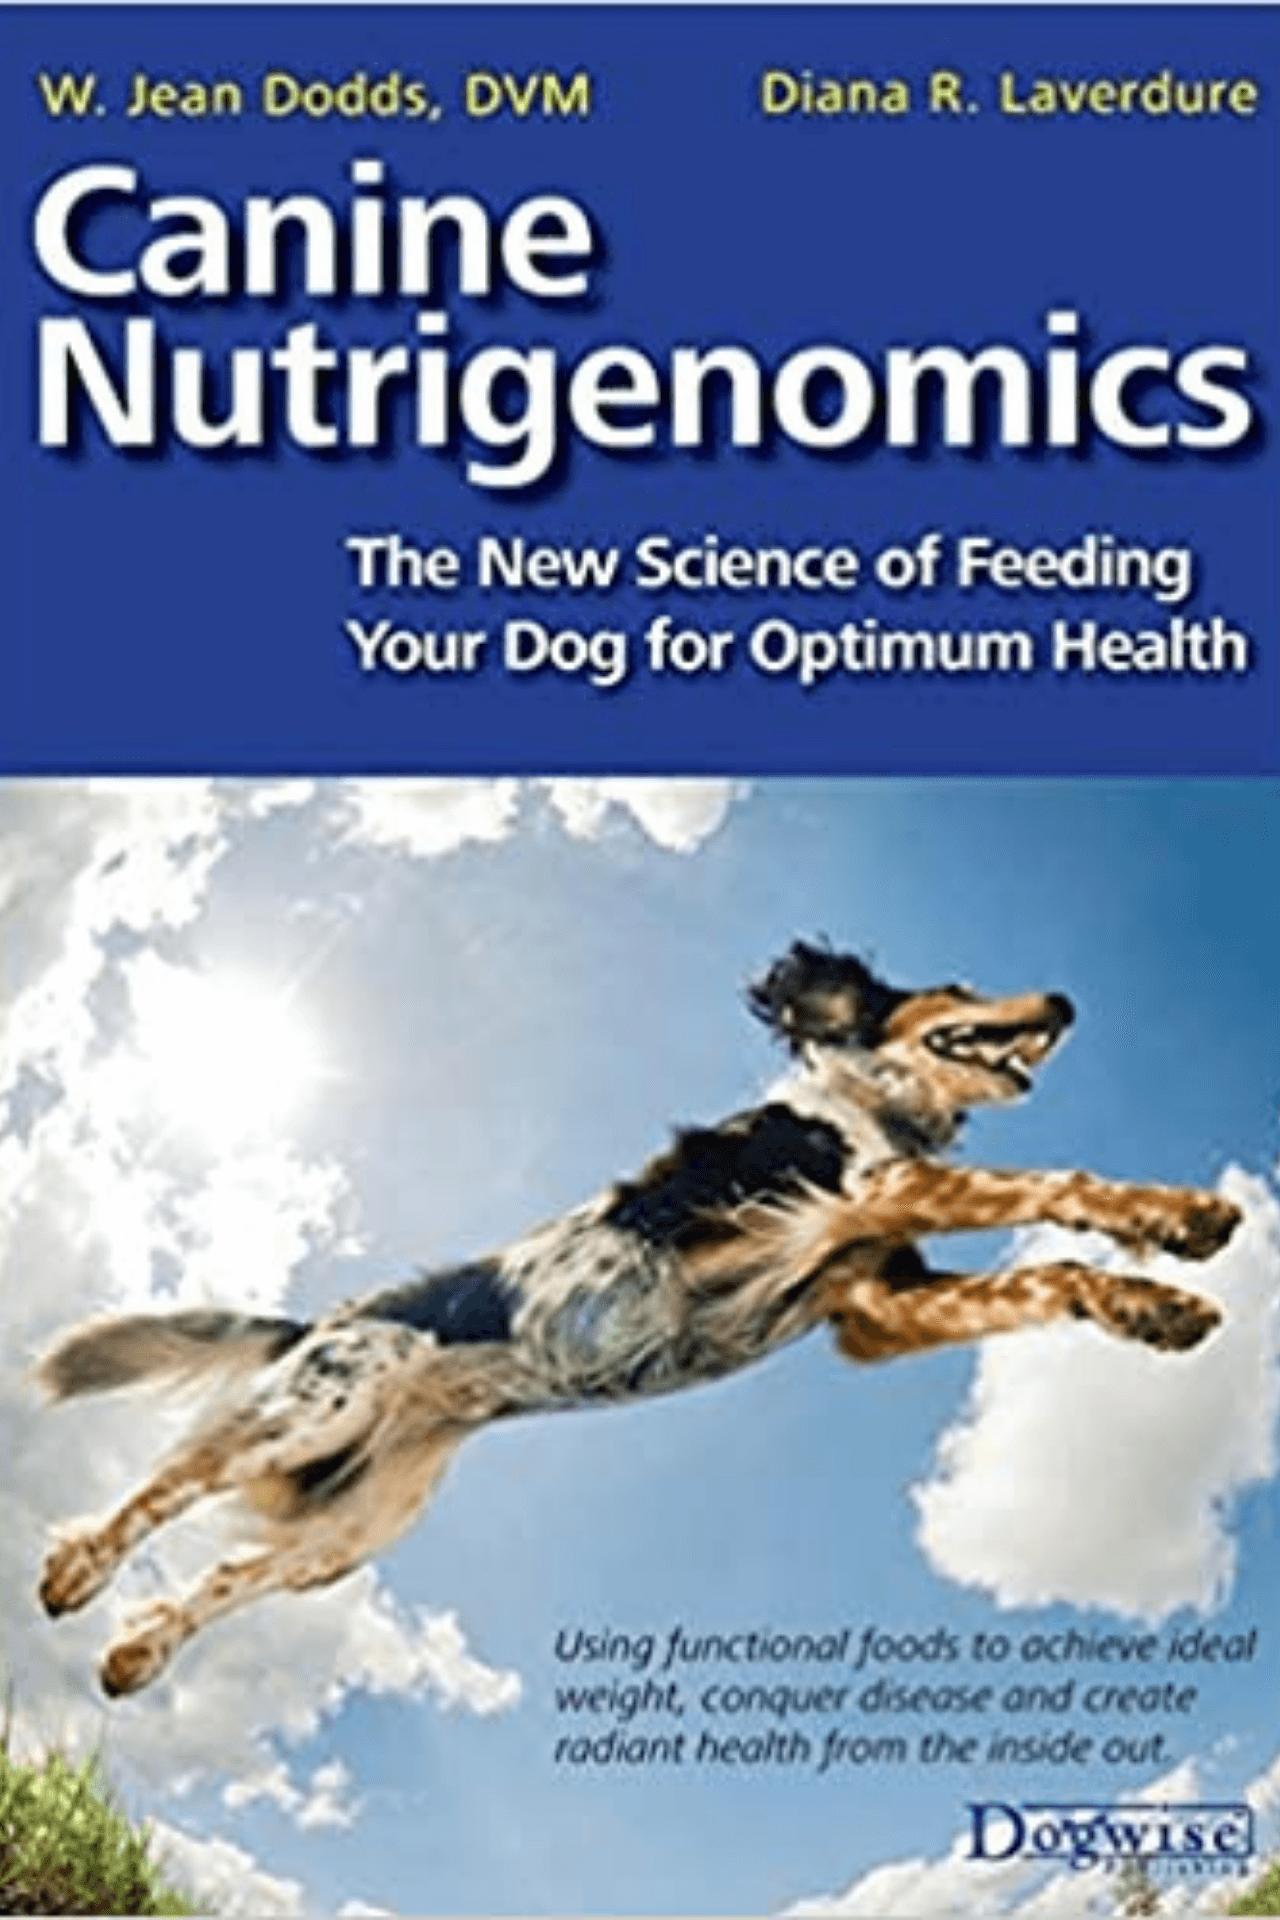 Book Cover: Canine Nutrigenomics